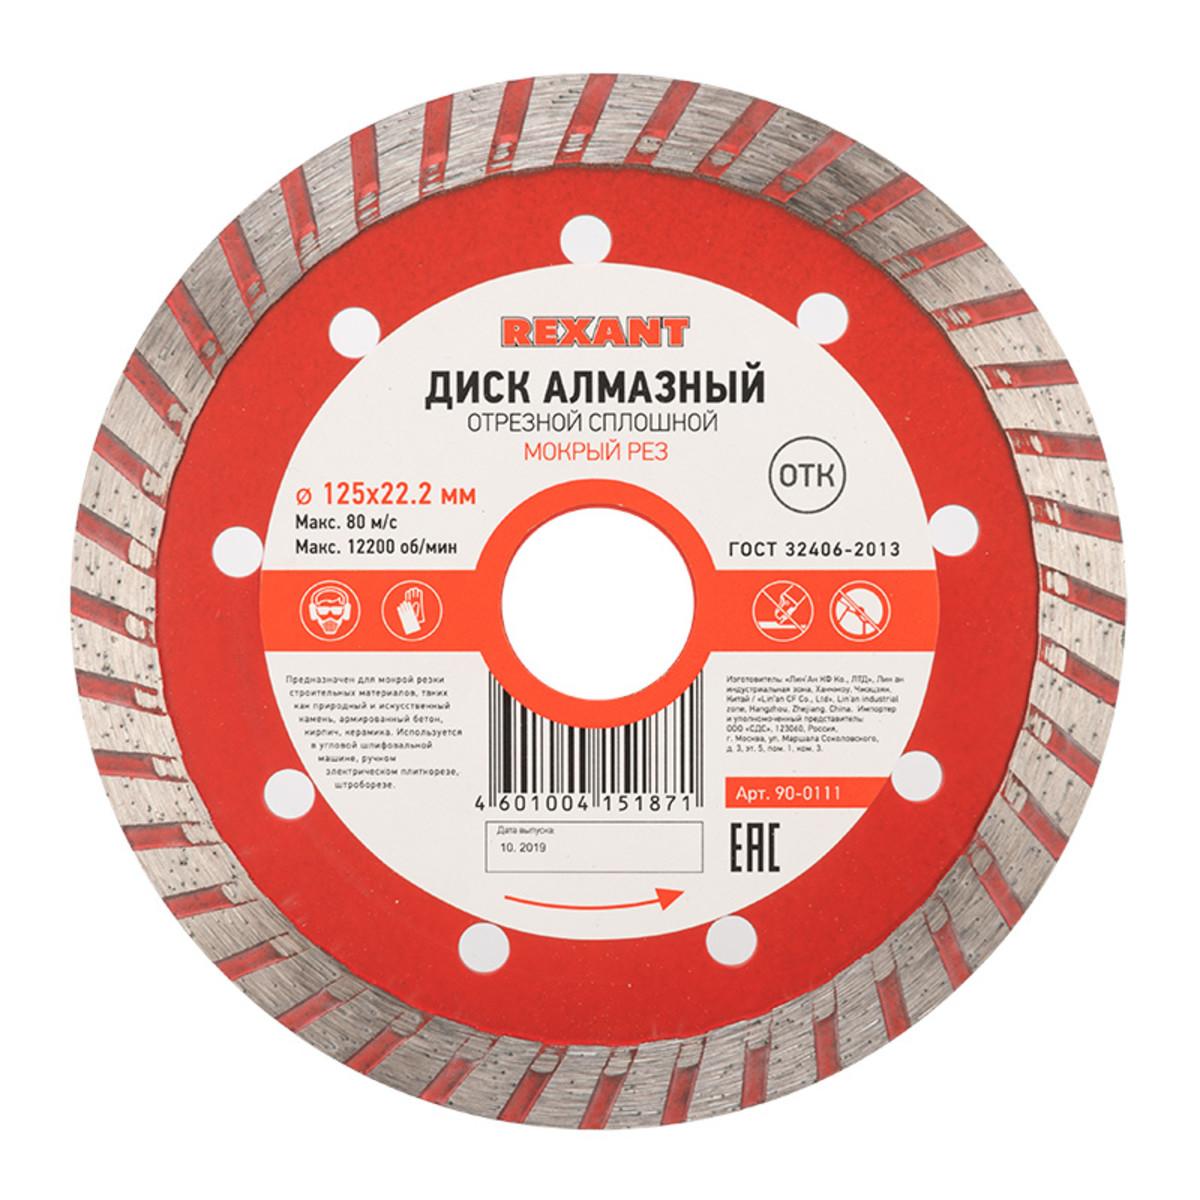 Диск Алмазный Rexant Turbo По Бетону Для Сухой Резки 125x222